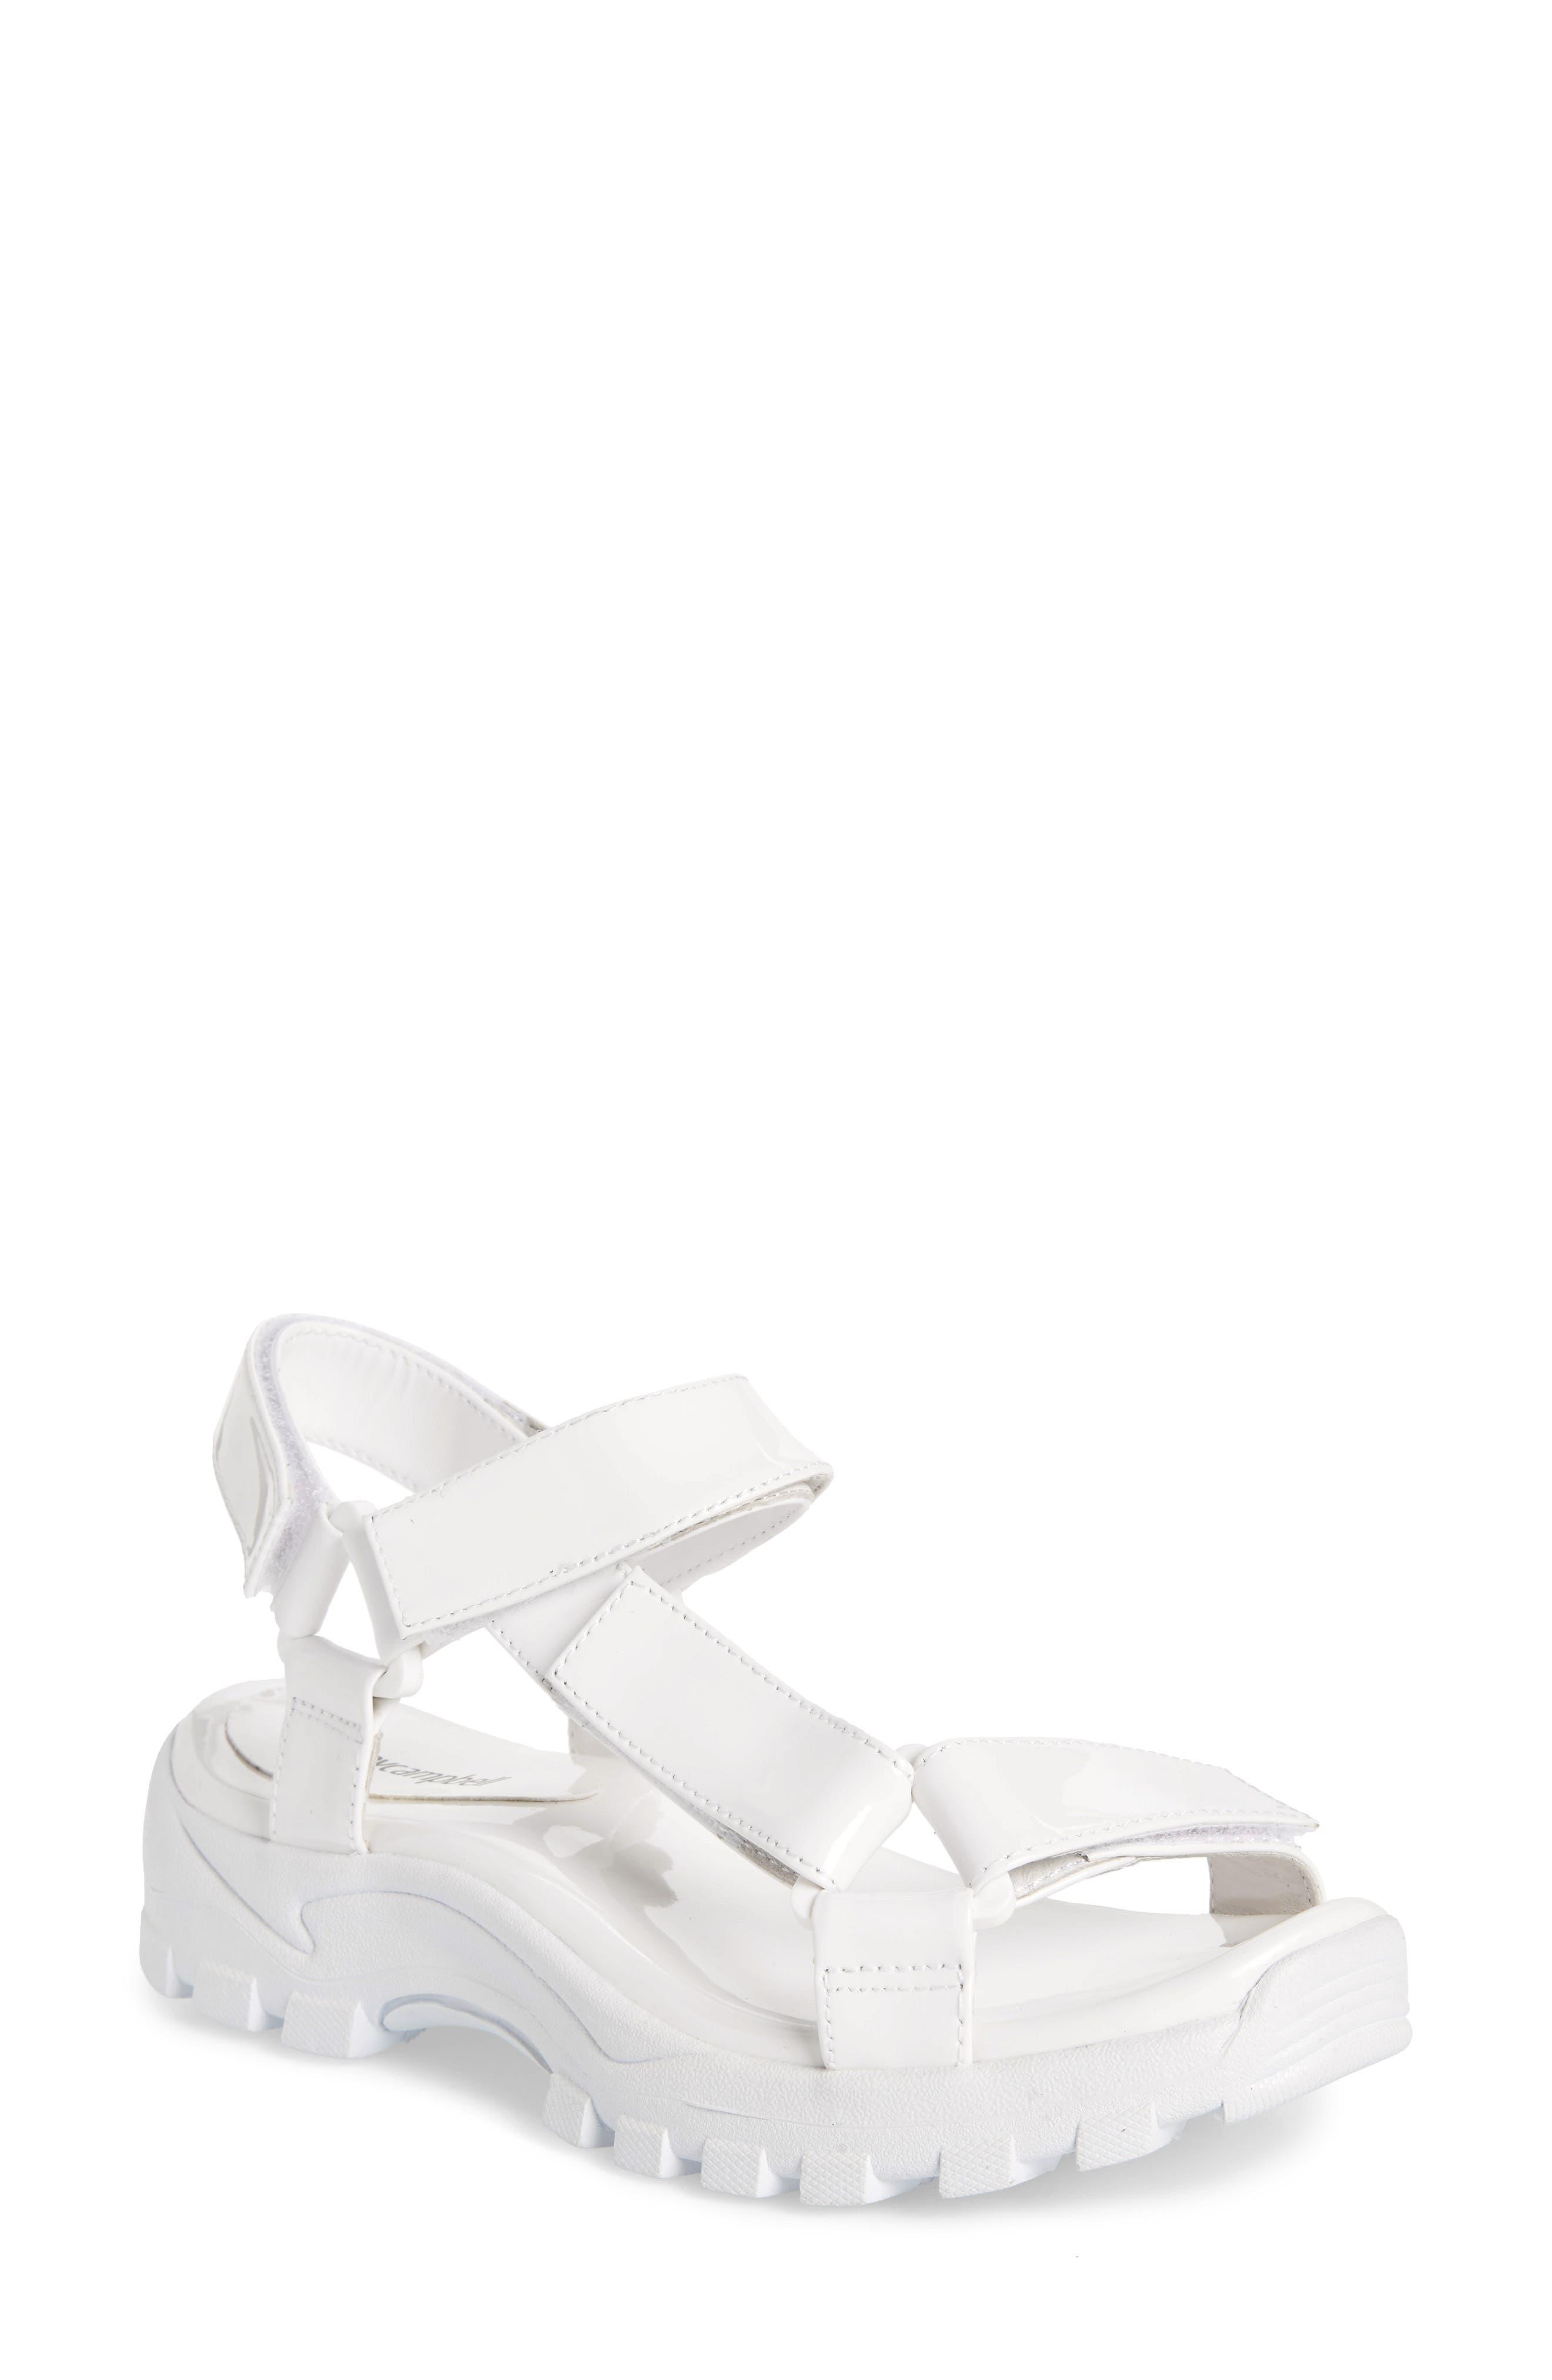 Patio Sport Sandal, Main, color, WHITE PATENT LEATHER/ WHITE